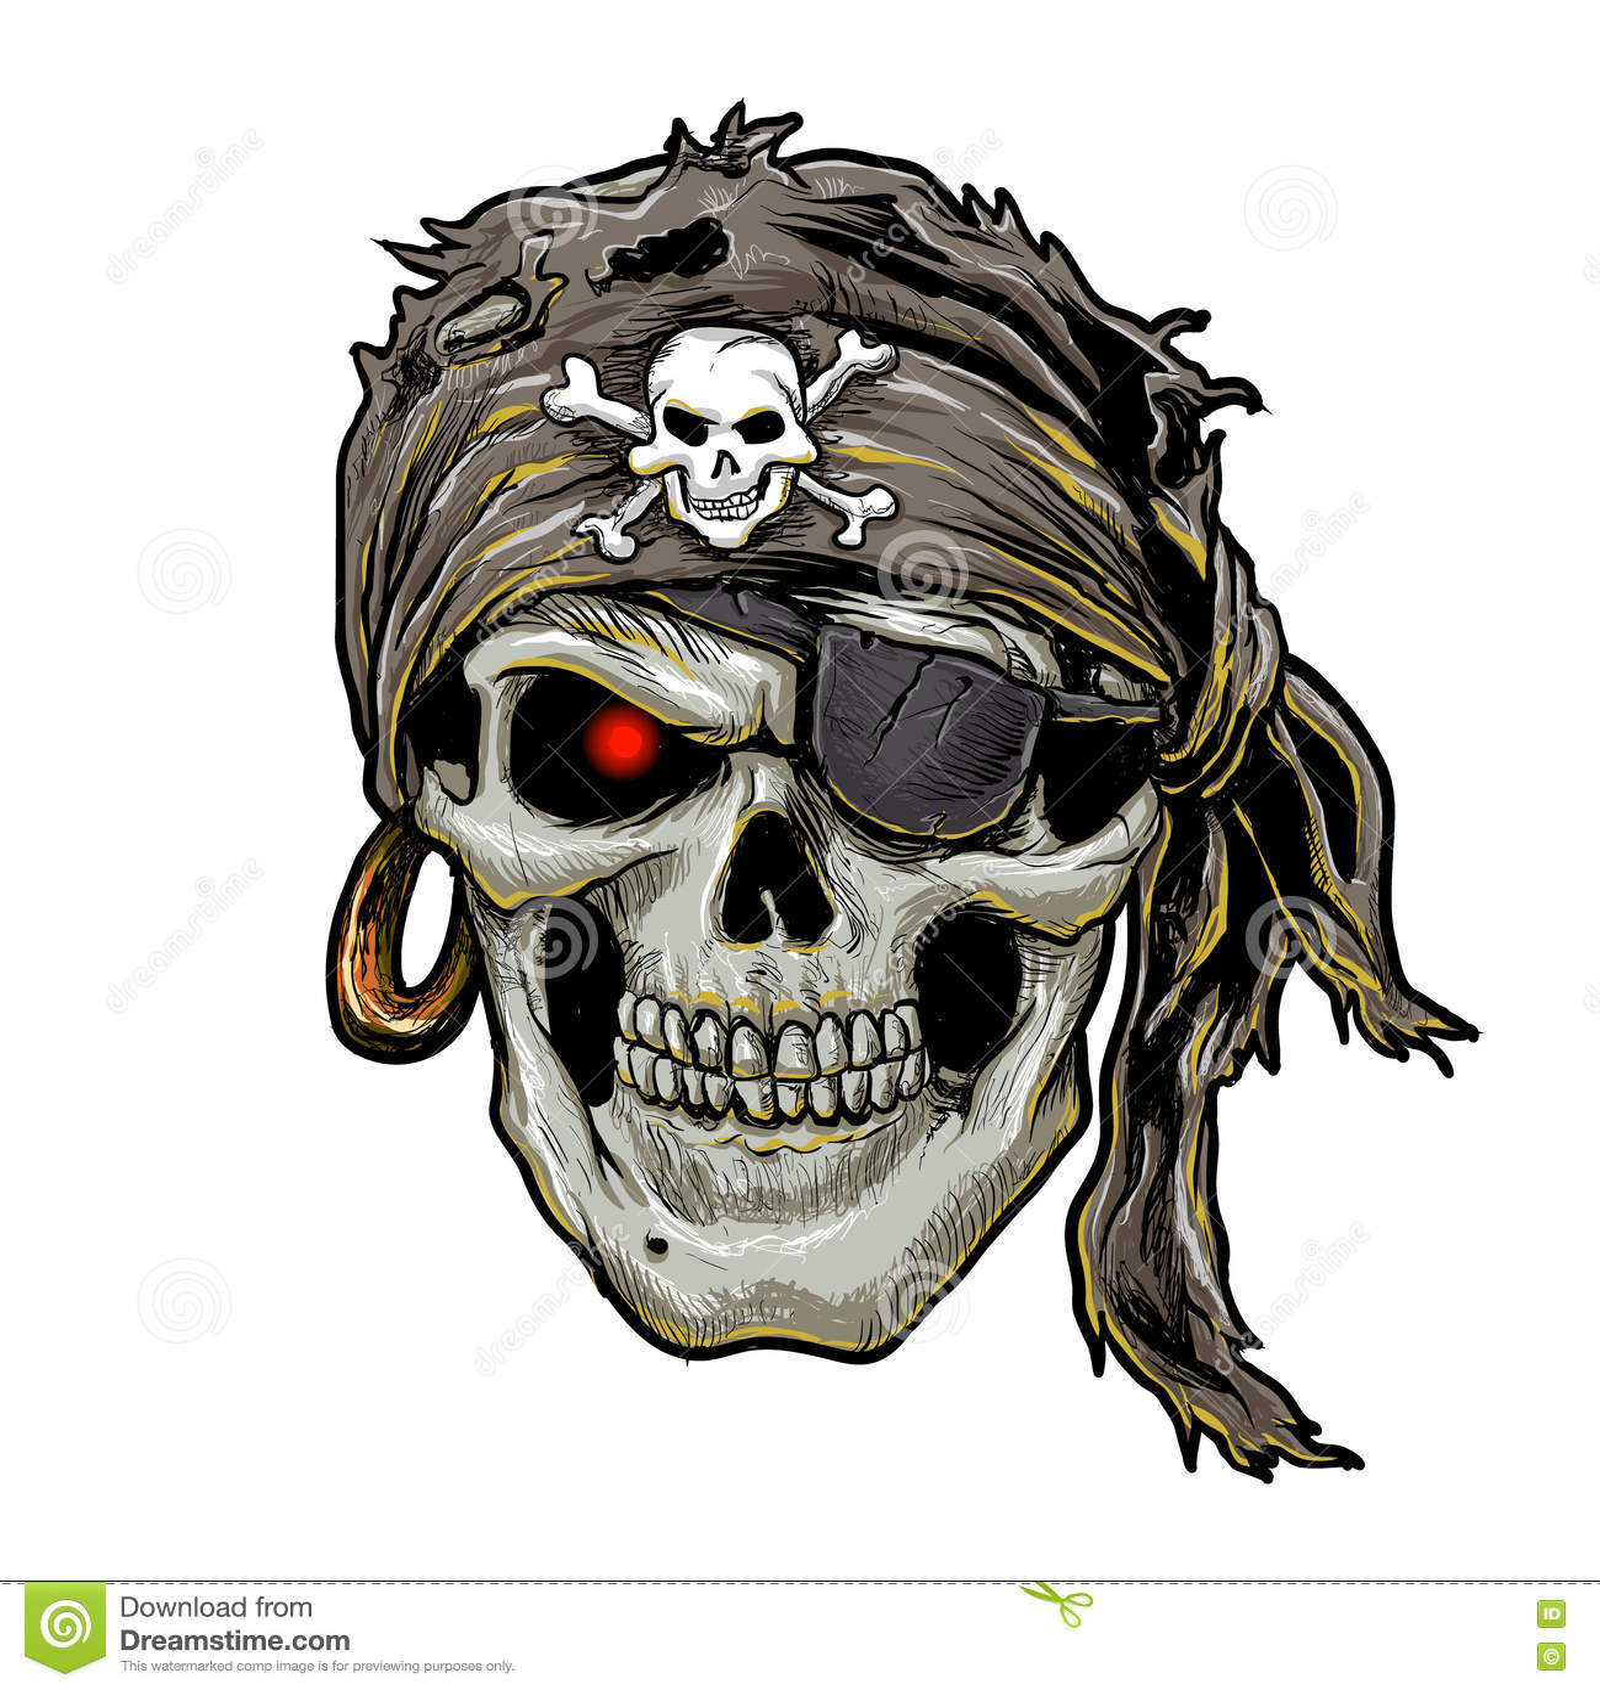 Pirate Skull With Black Bandana Skull Art Stock Vector Illustration Of Bone Bandana 72066858